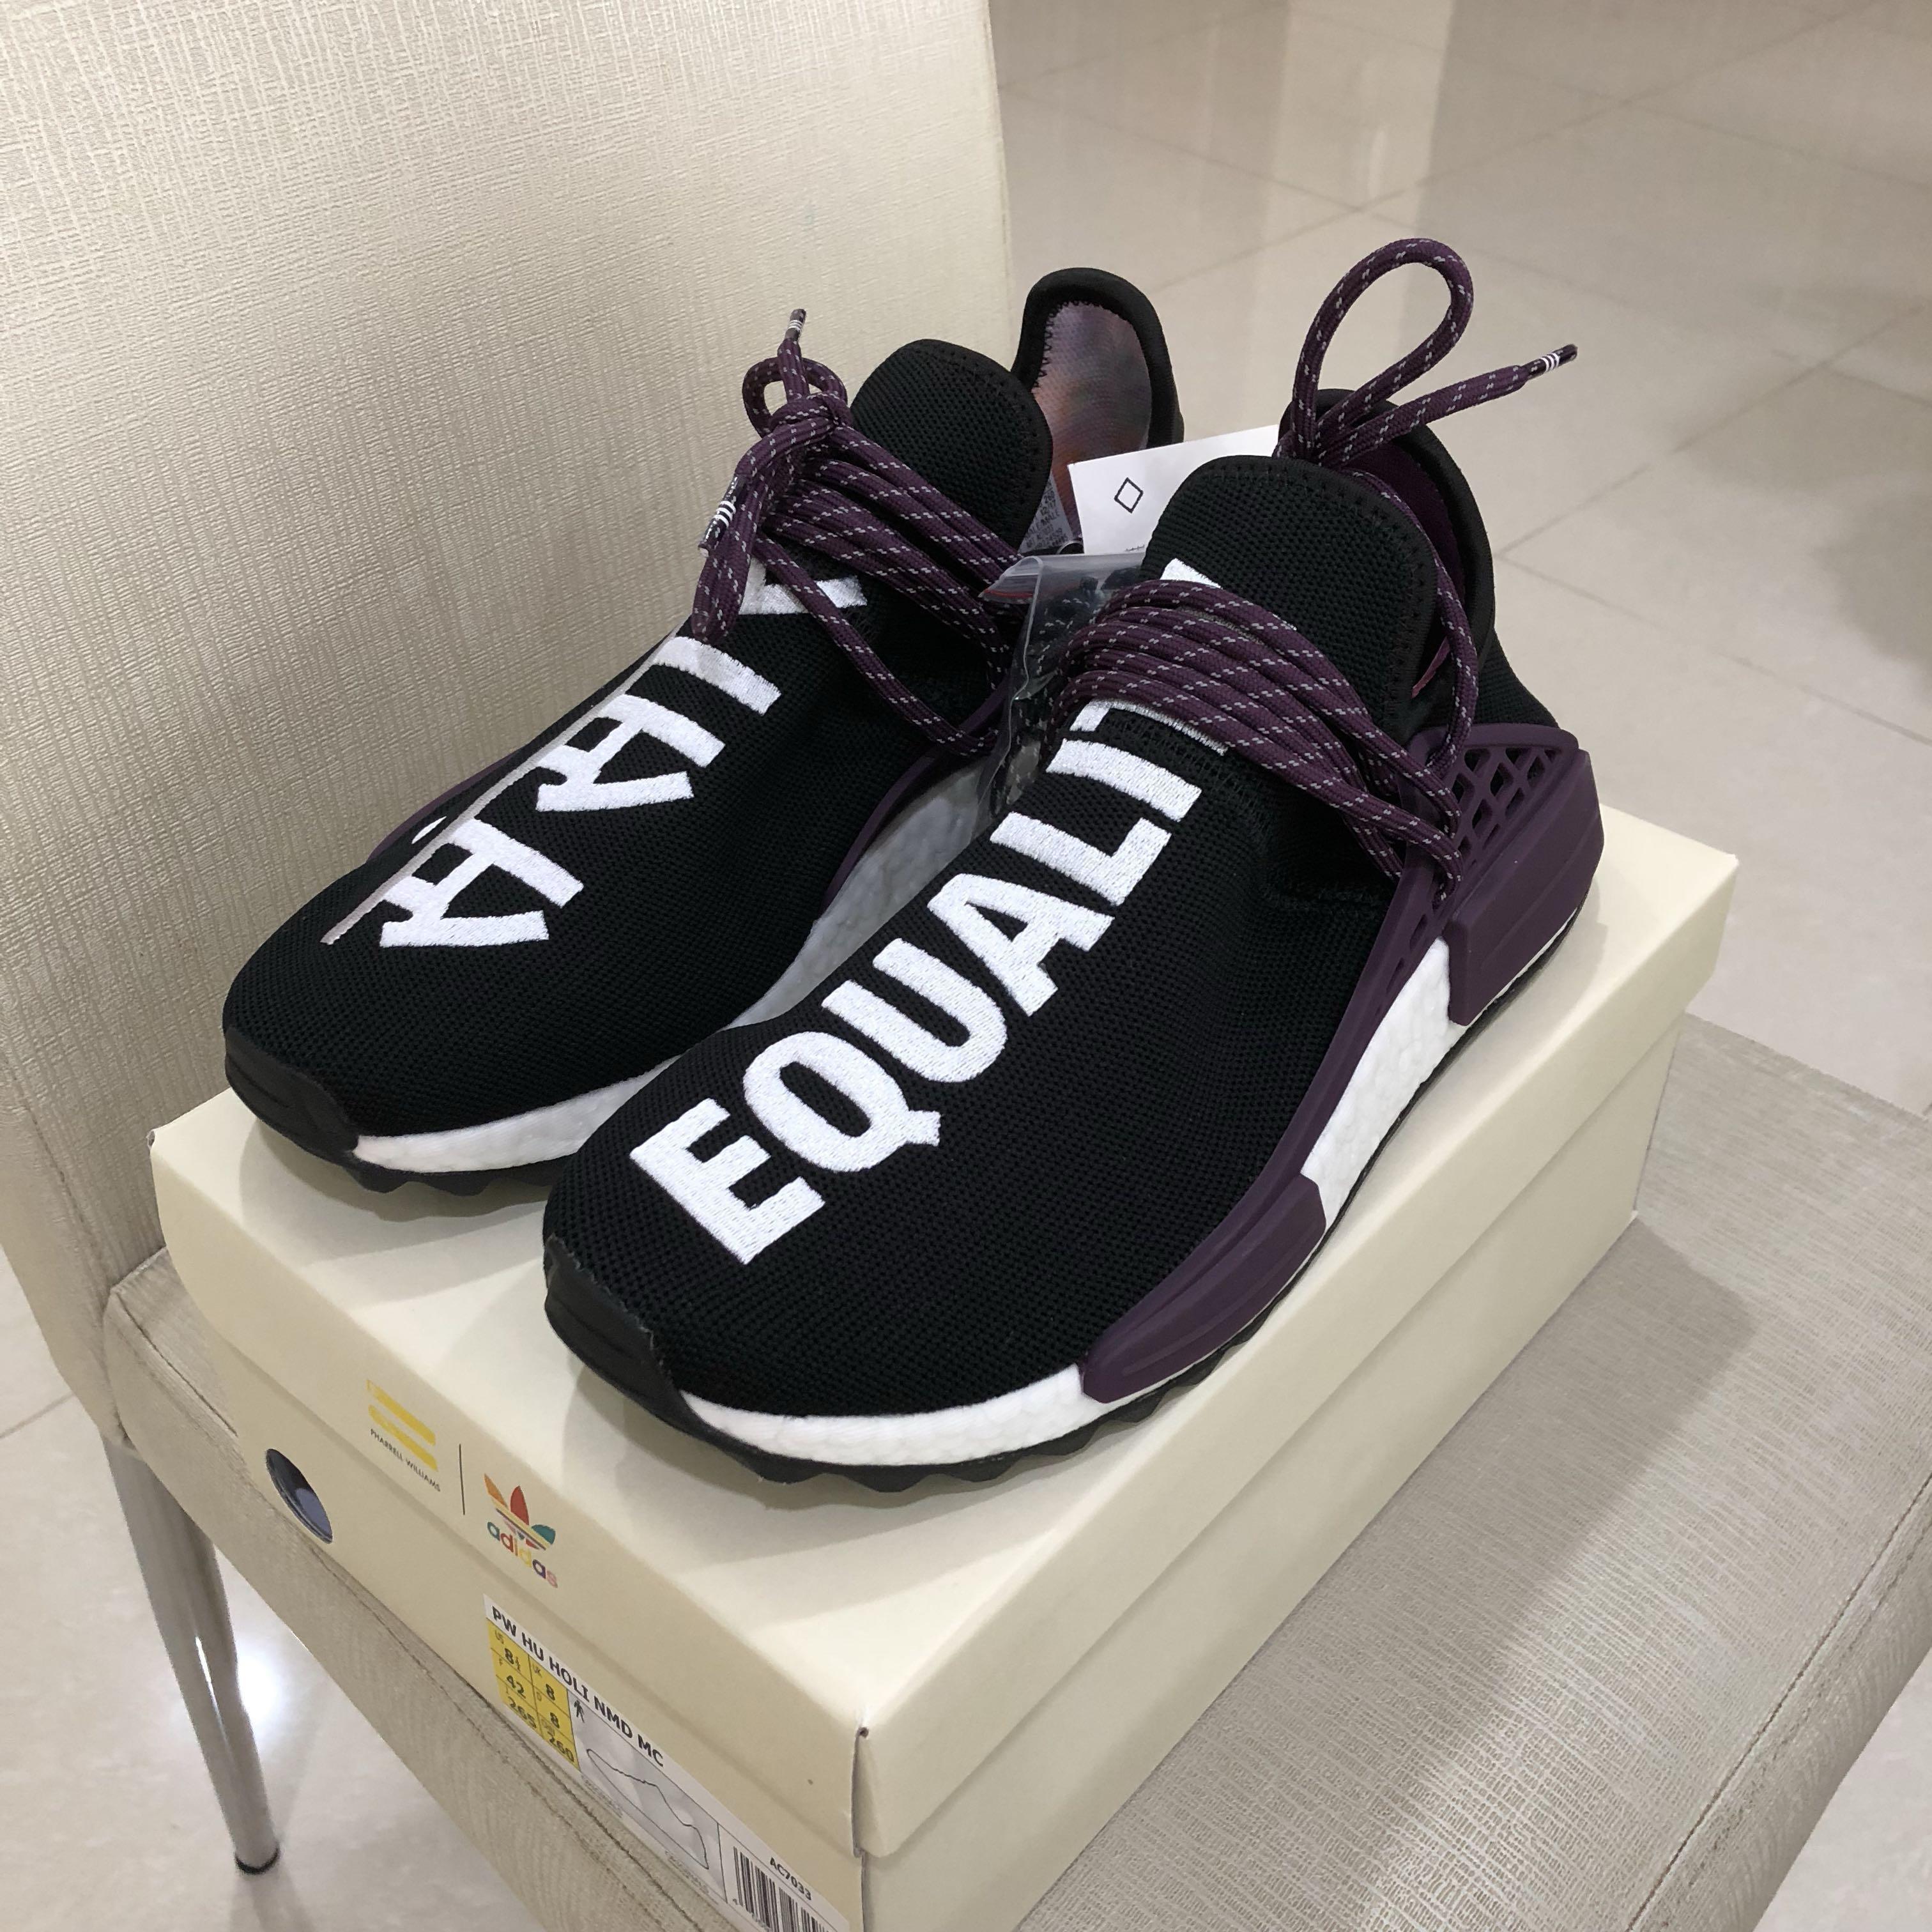 online store 5fb7f e11fe Authentic Adidas x Pharrell Williams NMD Hu Holi Core Black ...